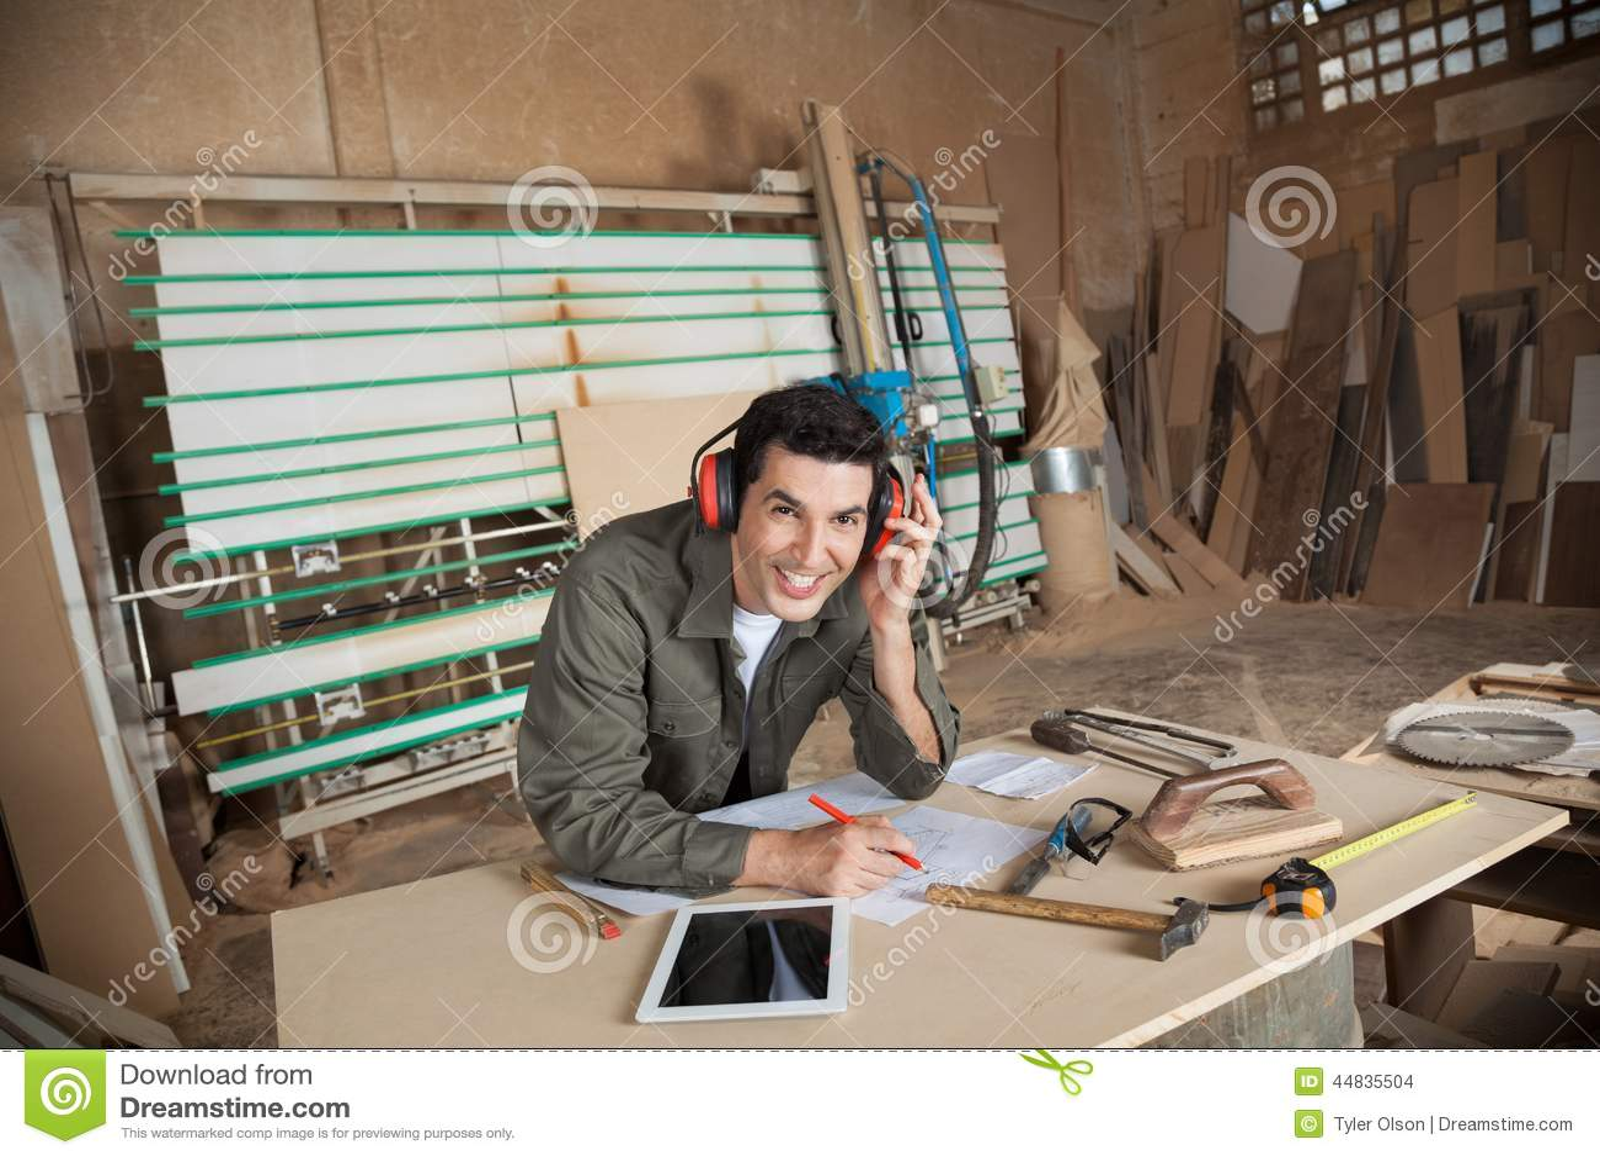 Carpintero feliz Working On Blueprint en taller